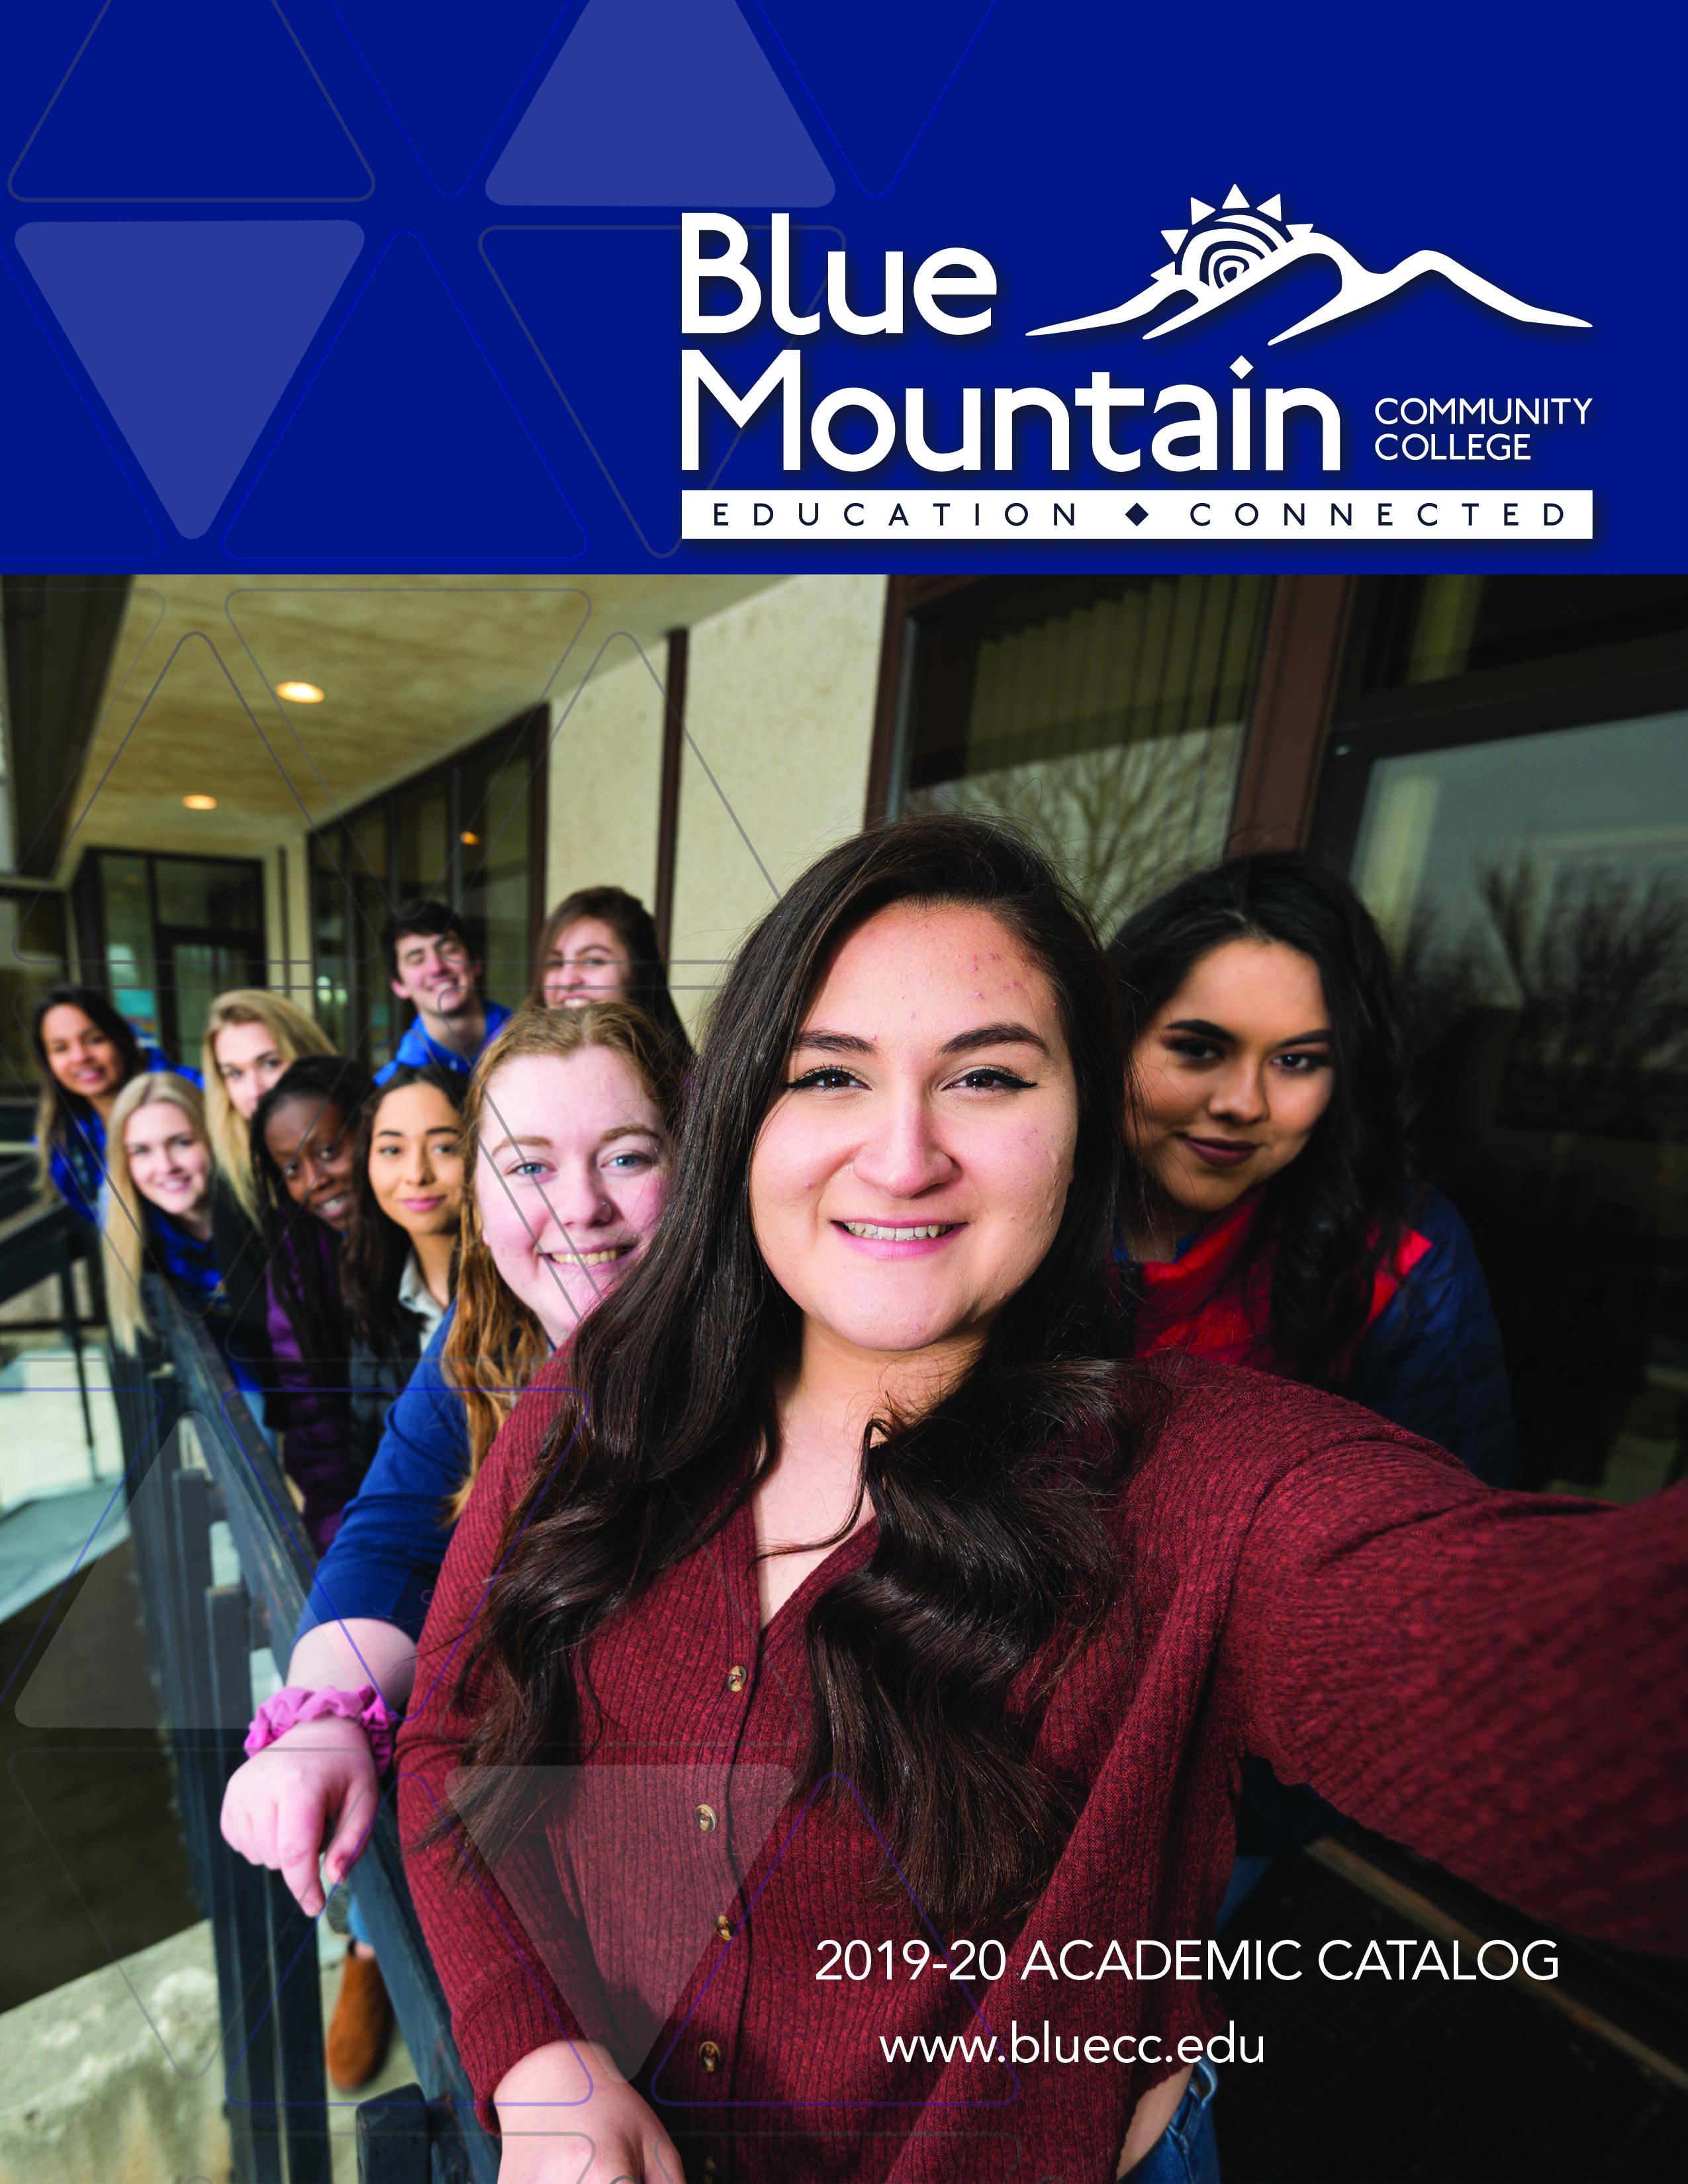 Bmcc Academic Calendar 2020 Blue Mountain Community College   Acalog ACMS™